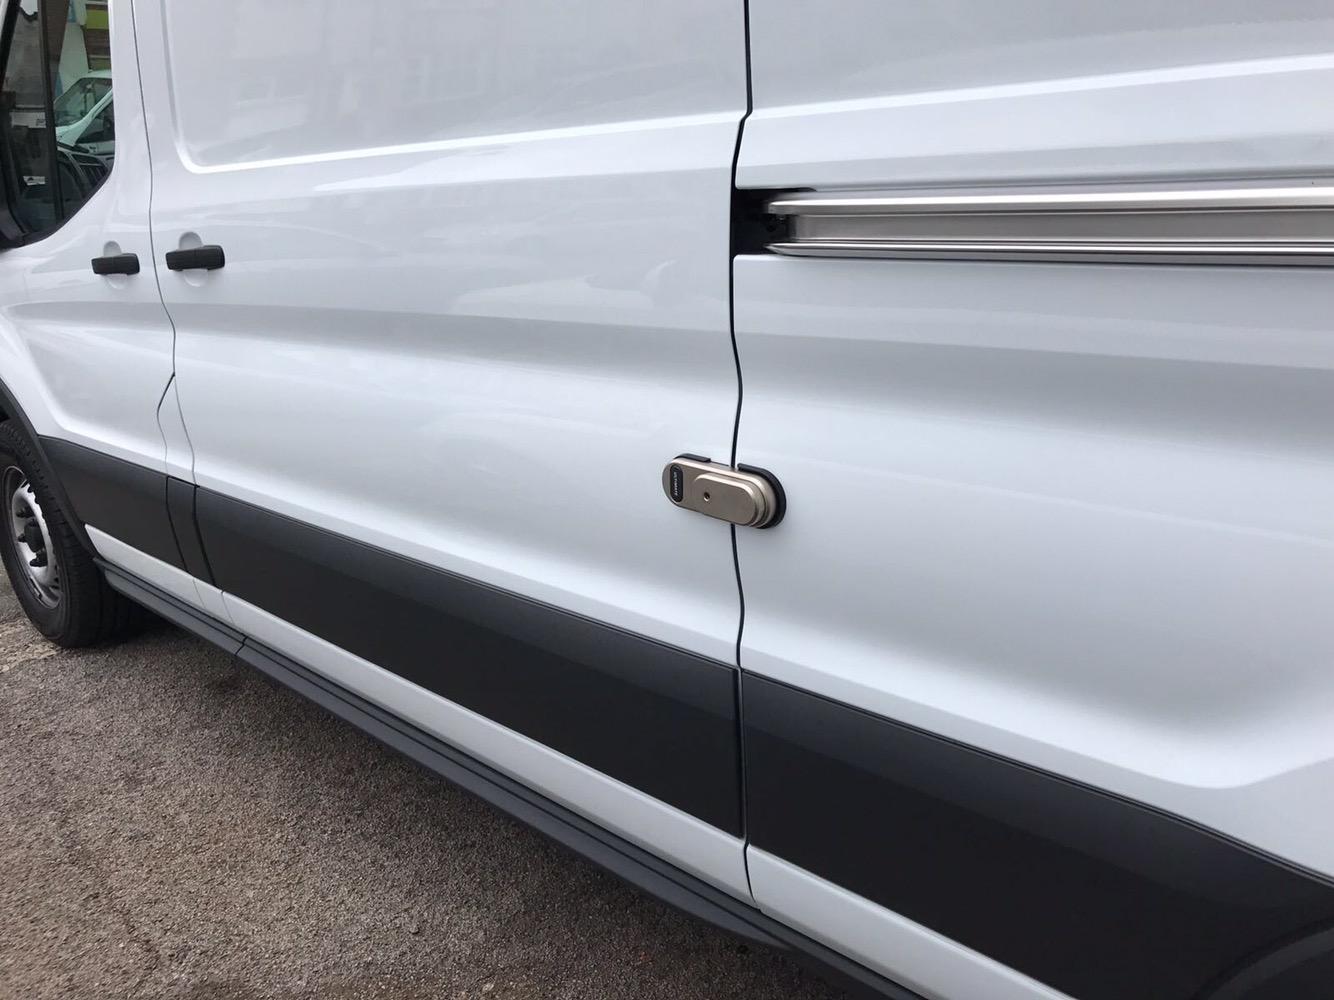 ultimate locks for new shape transit locks and tools ltd